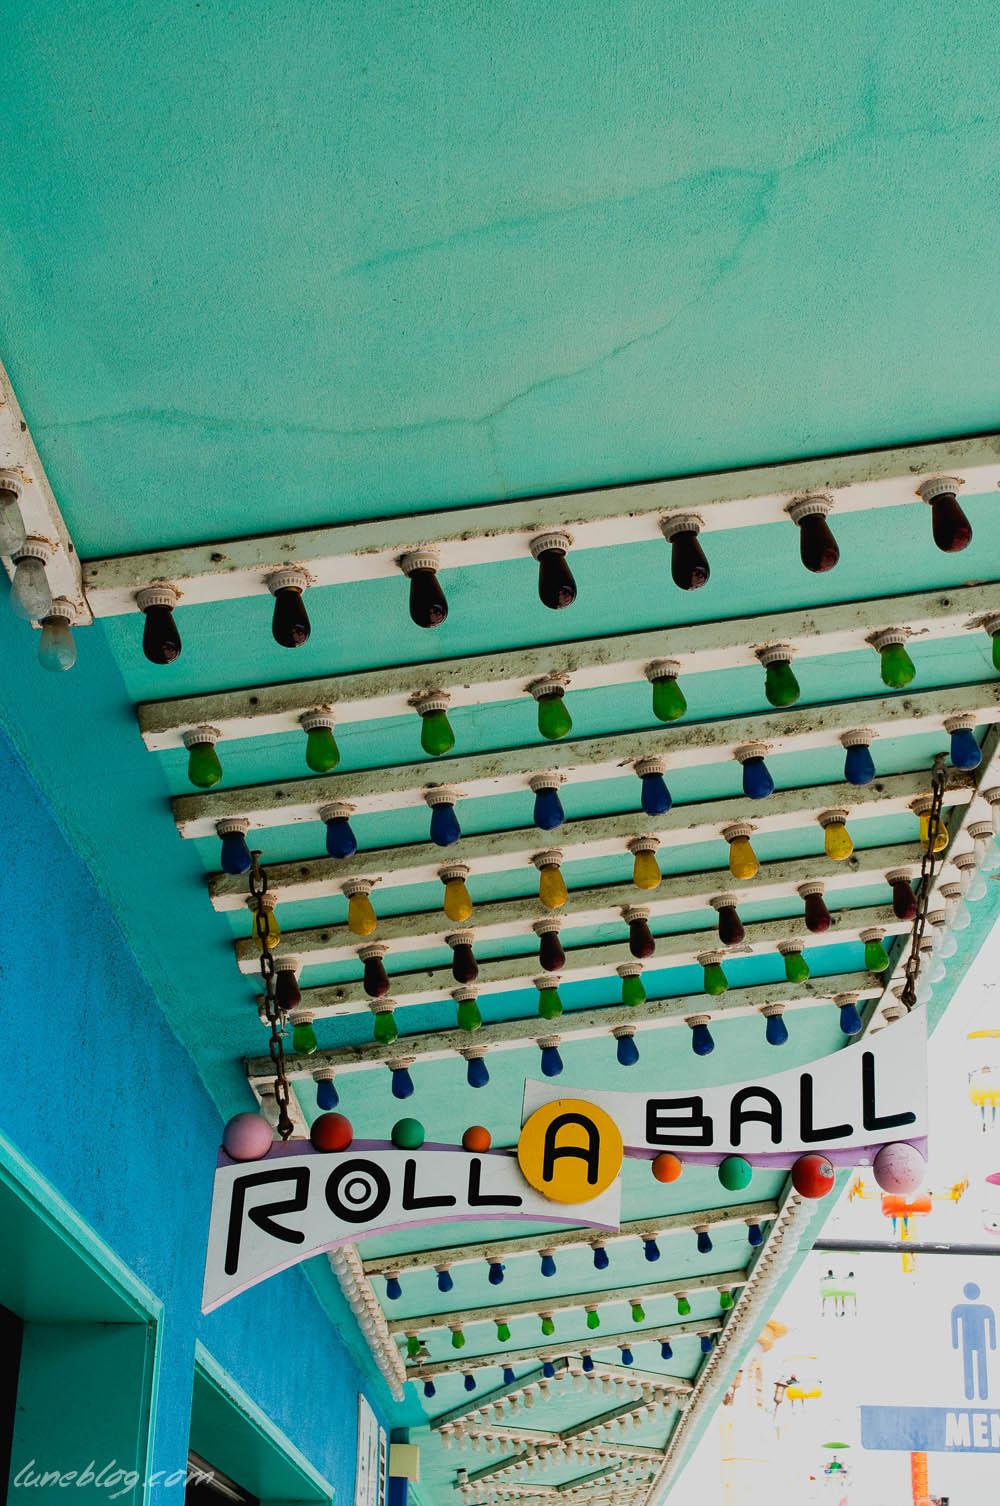 roll a ball santa cruz vintage games